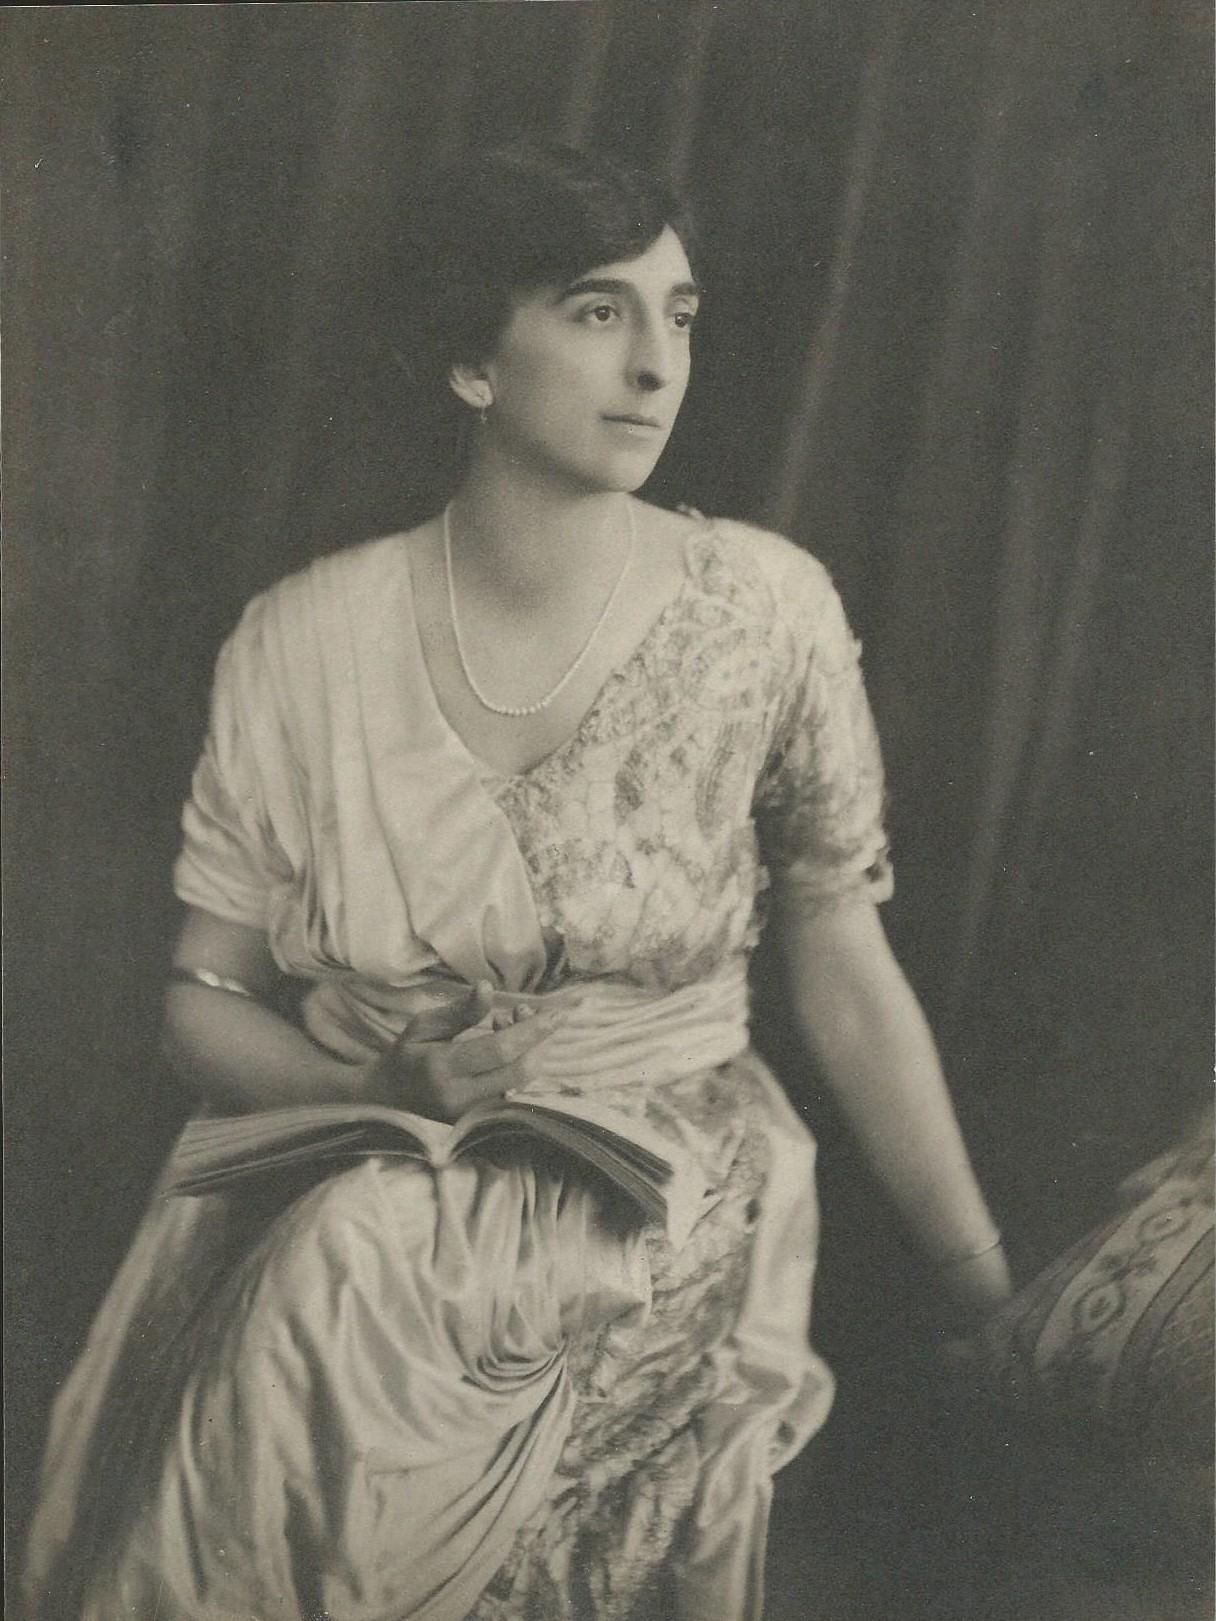 Elsie Pinkham